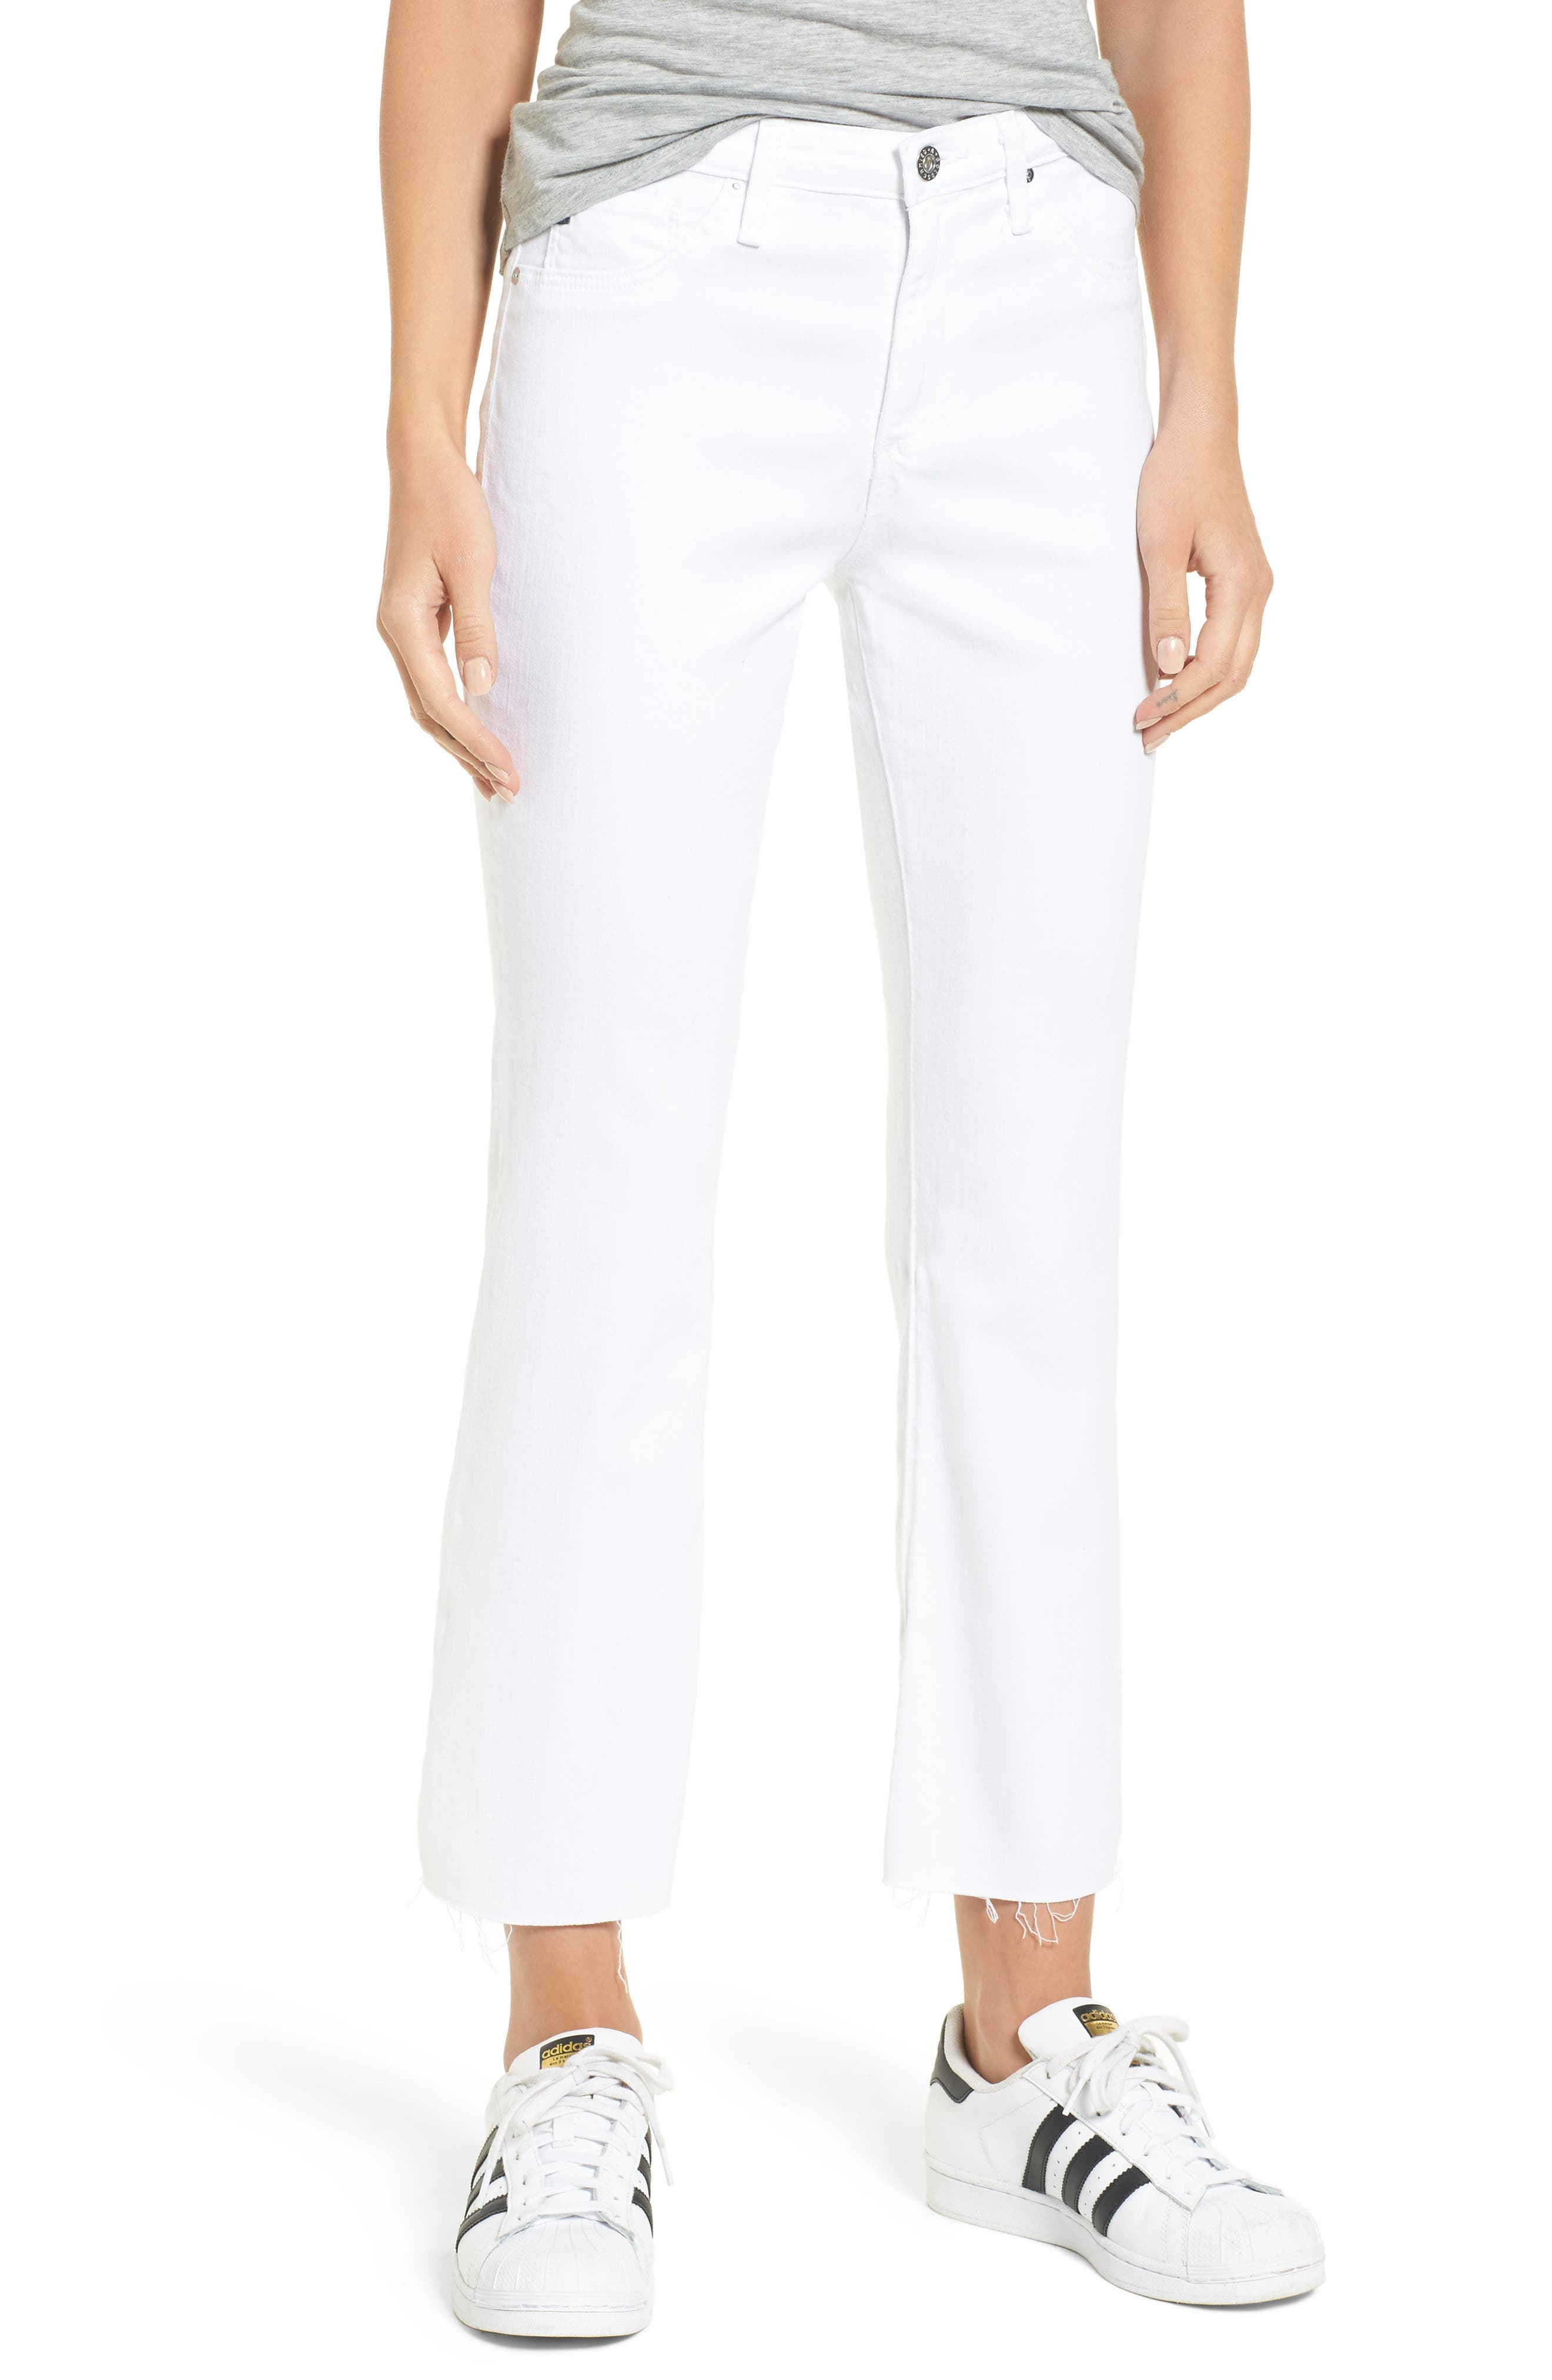 Jodi High Waist Crop Jeans,                         Main,                         color, 110